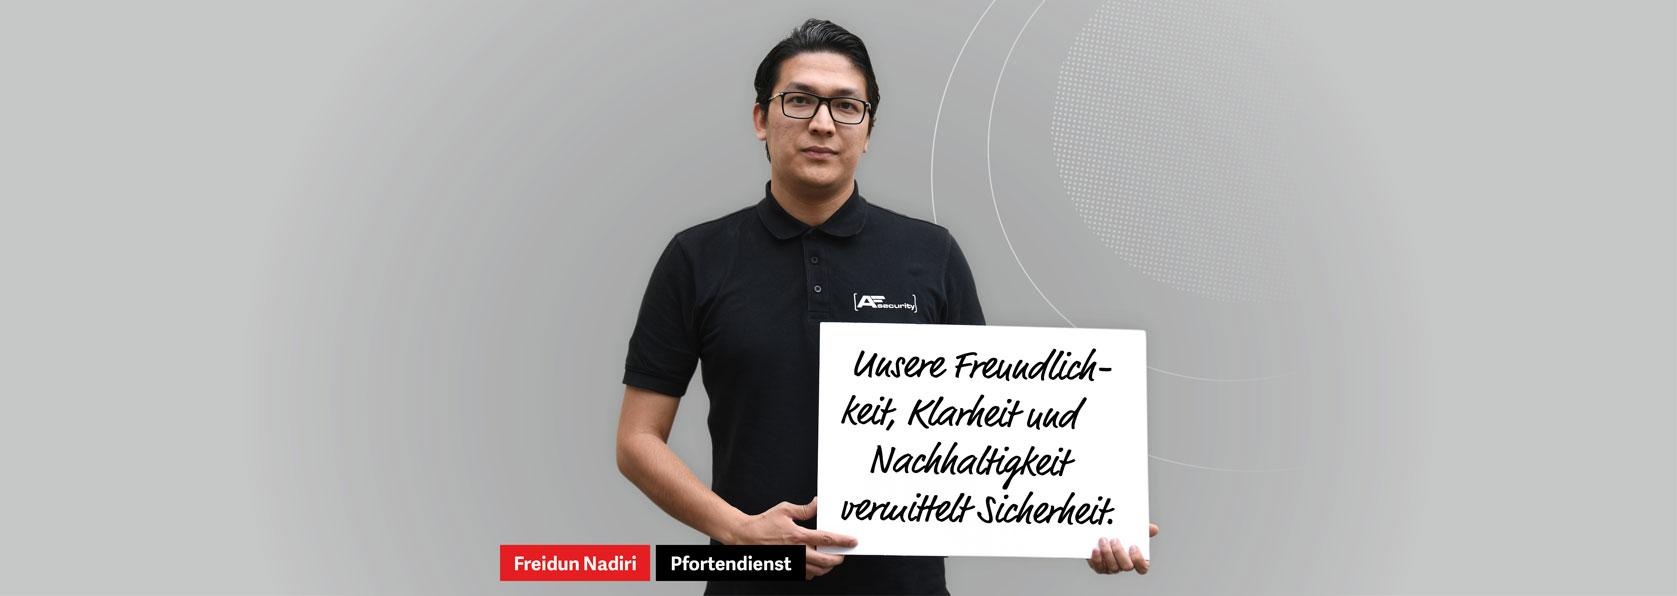 slider_freidun_nadiri